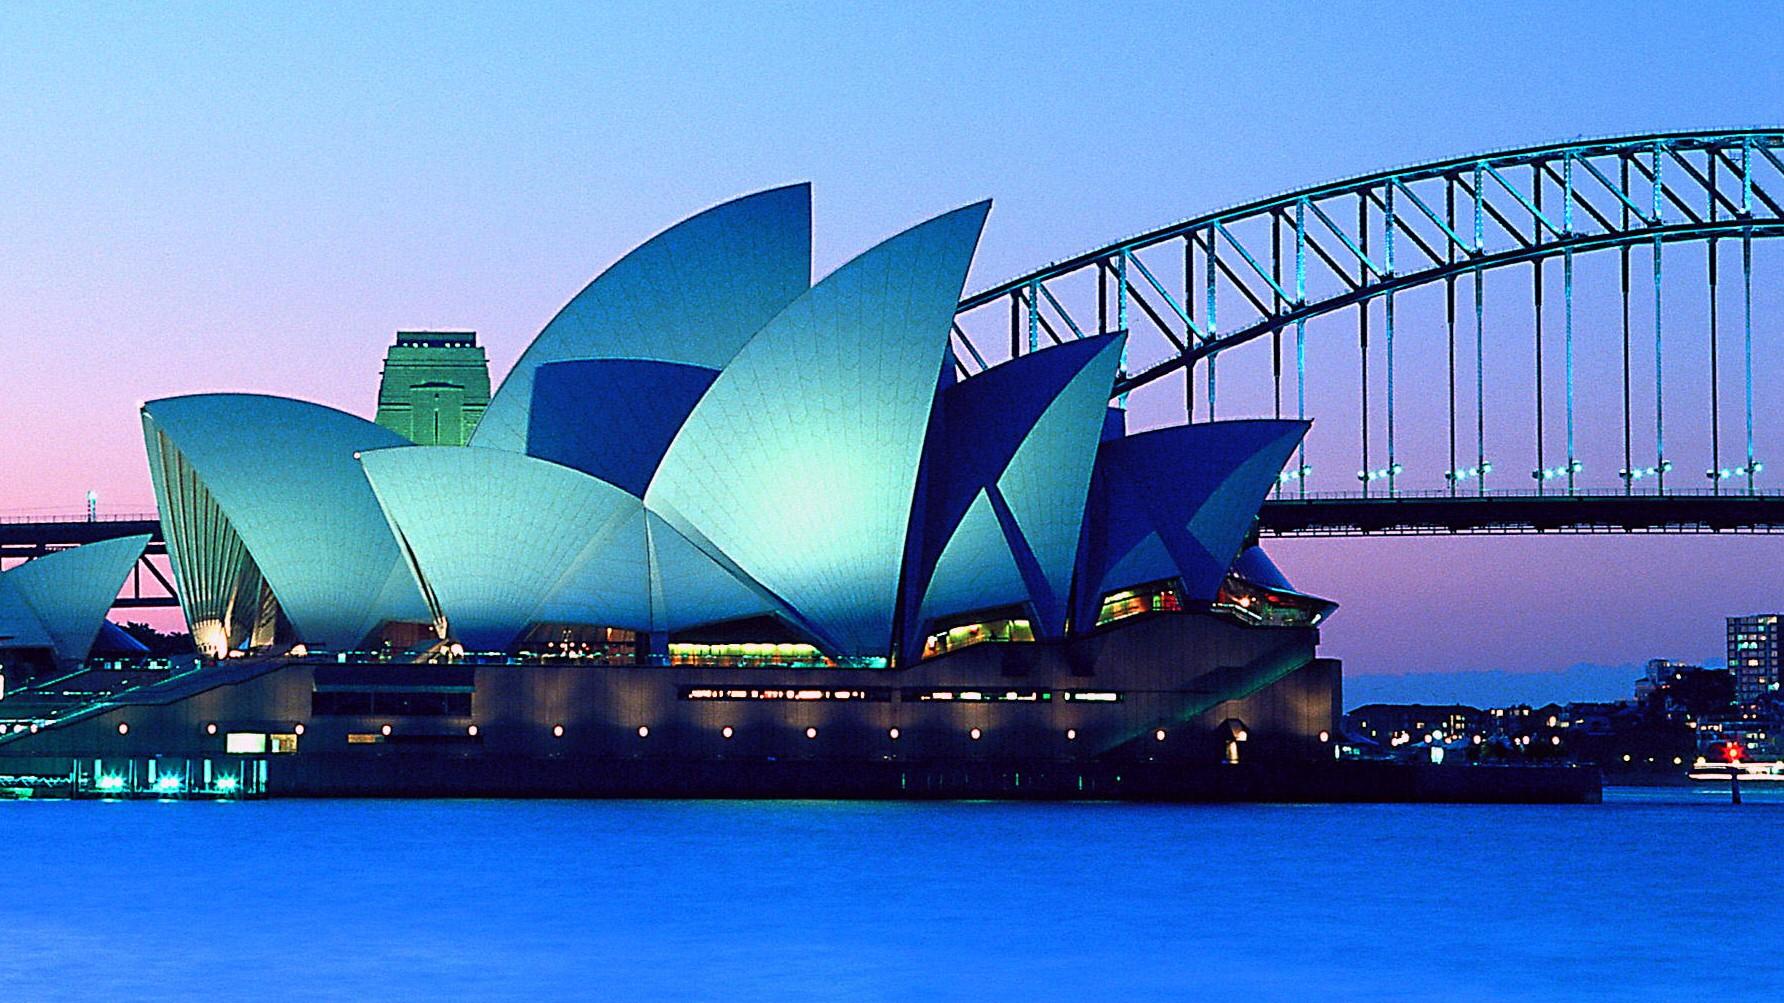 MSC and CMA CGM extend partnership with new Australia service 1